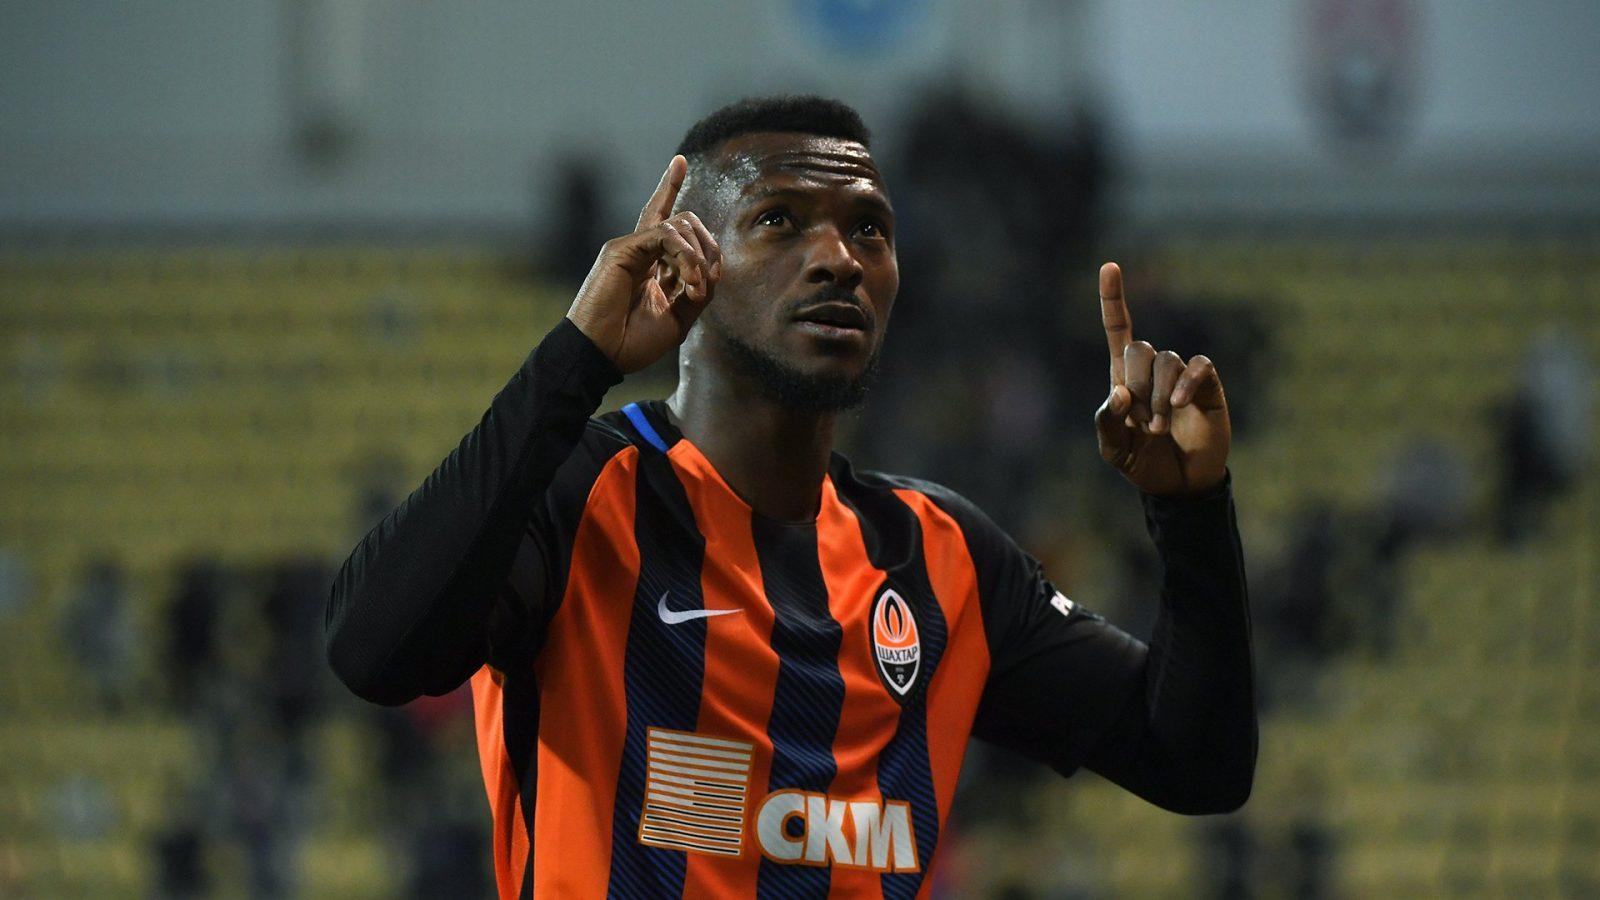 Olanrewaju Kayode declares his best days are still ahead